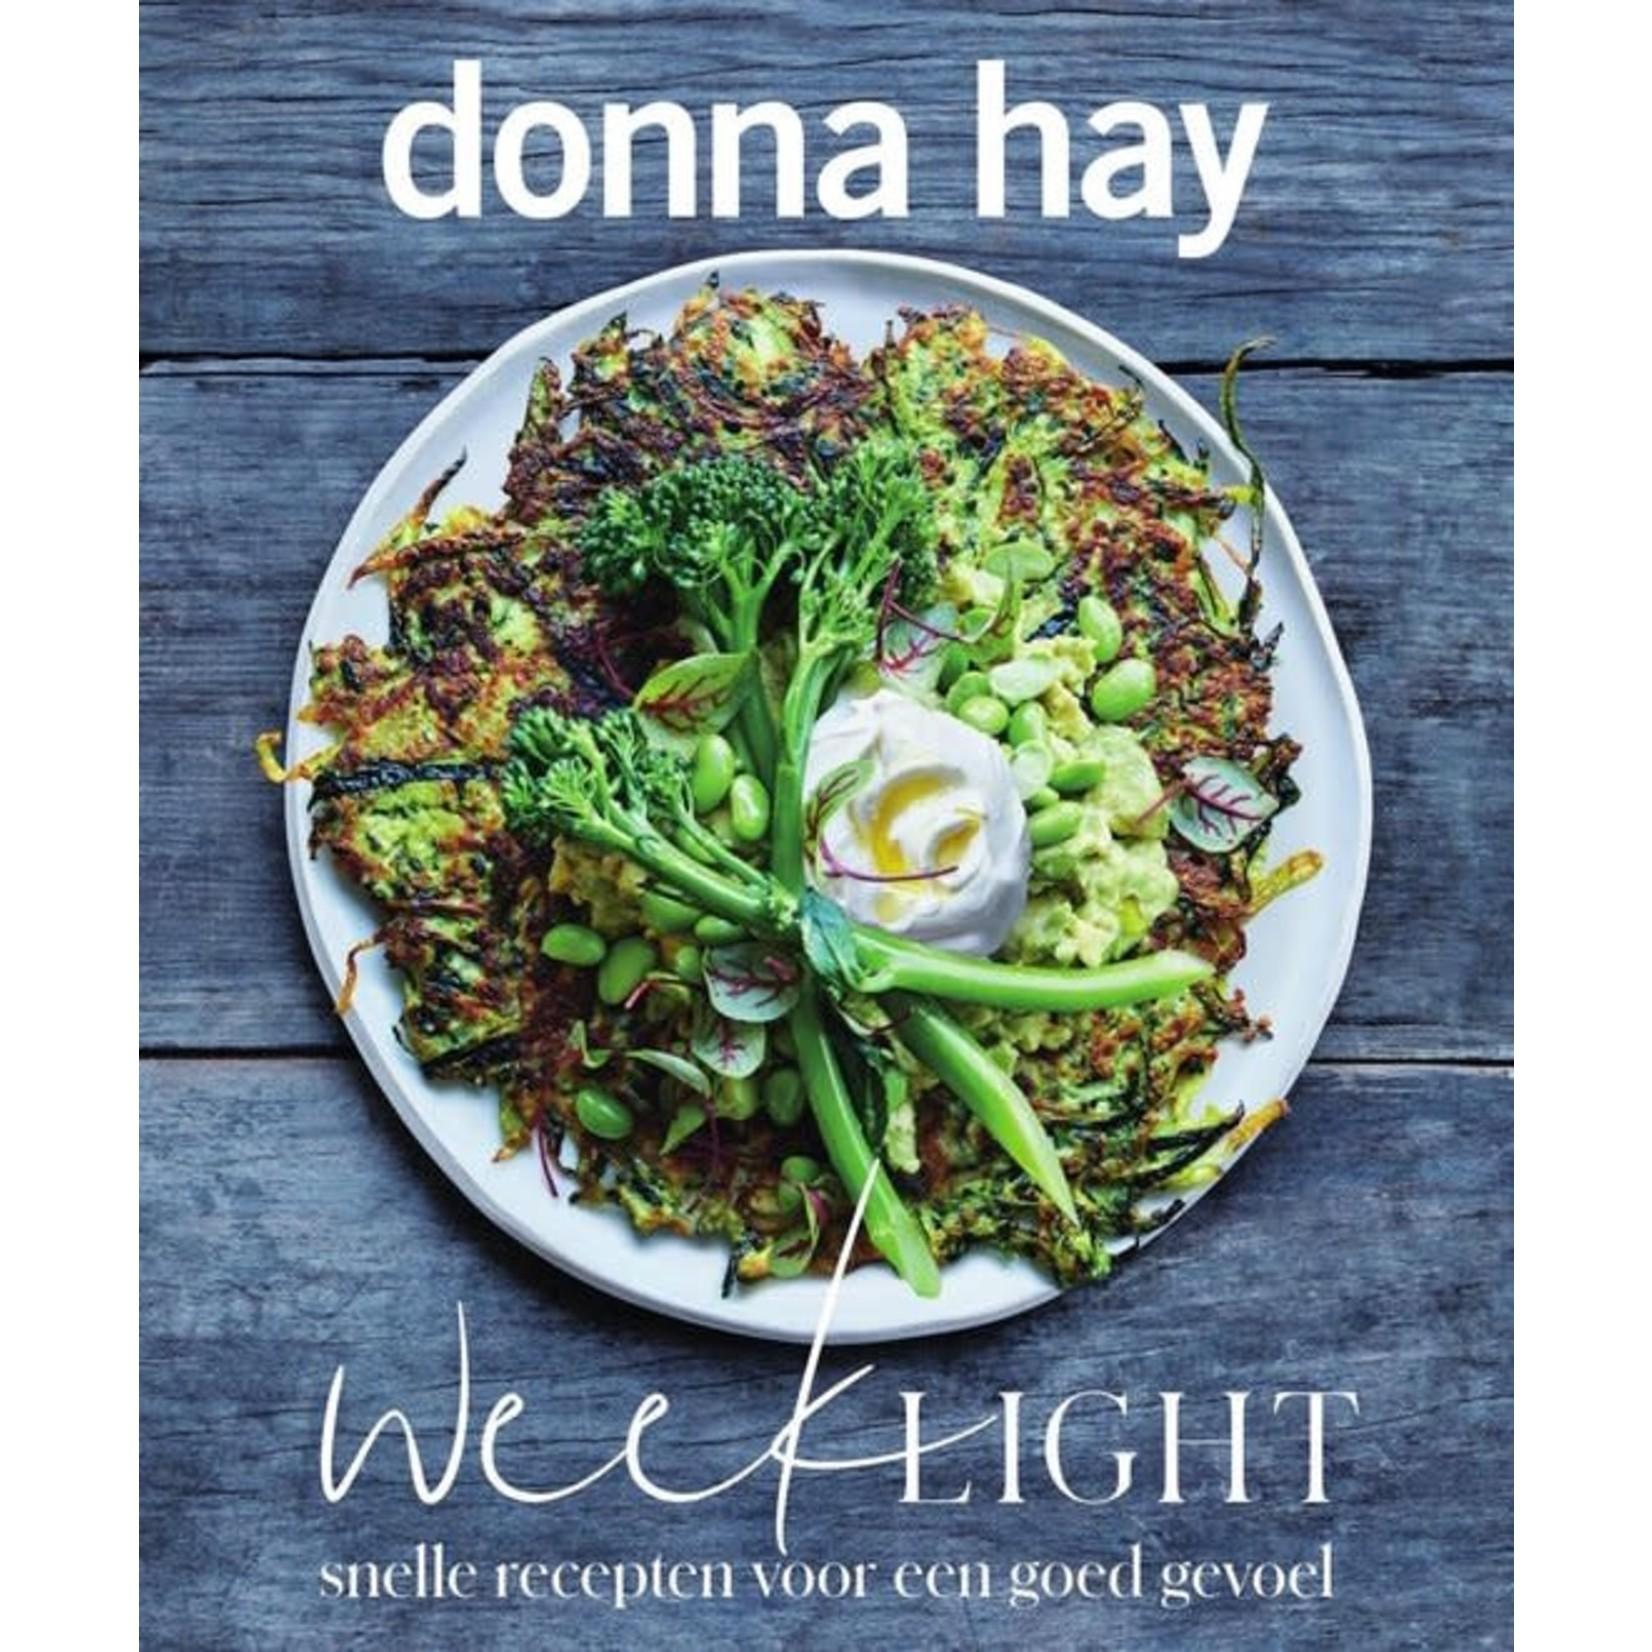 Donna Hay - Week light